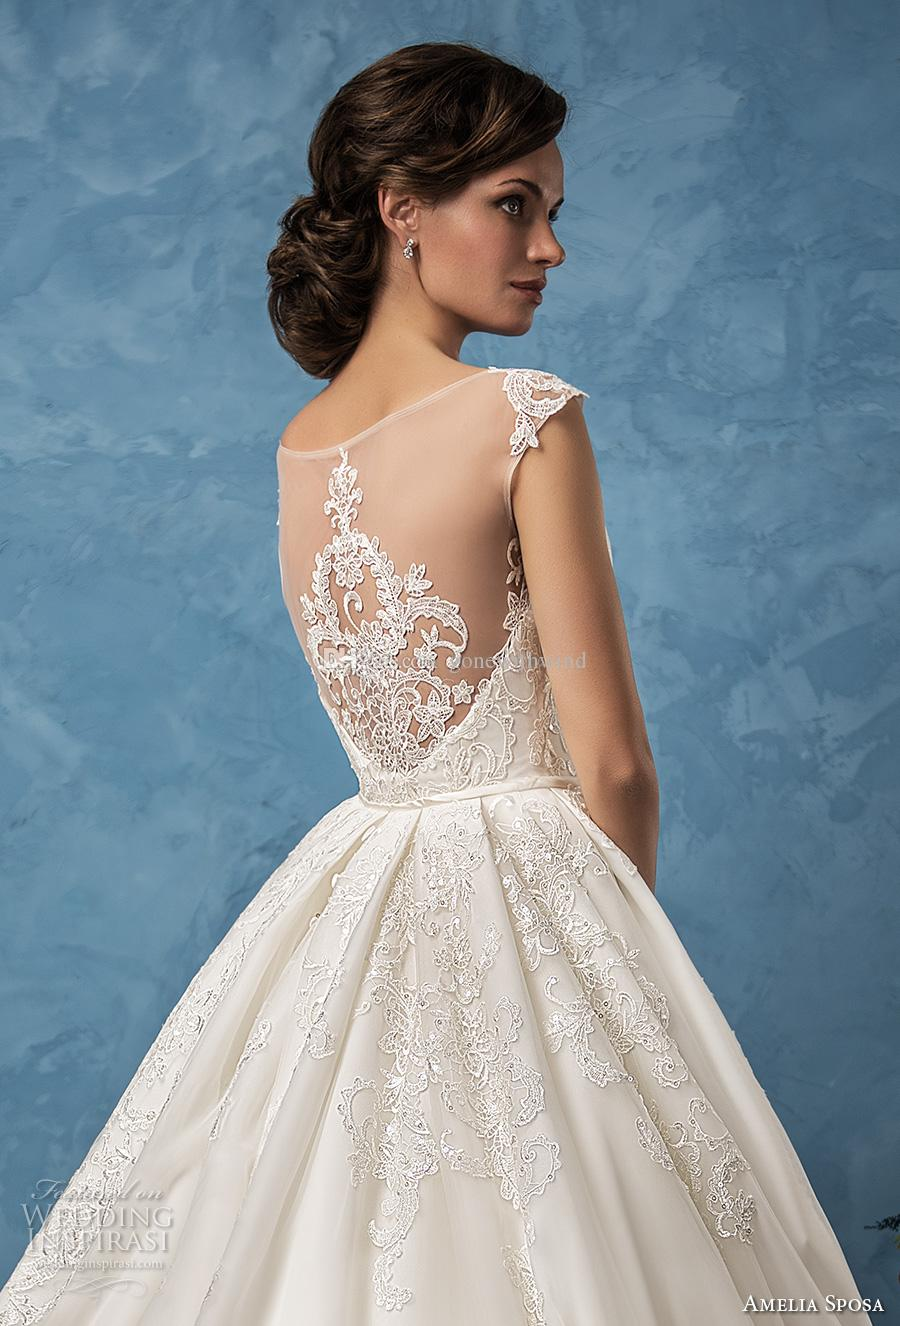 Mermaid Overskirt Wedding Dresses 2017 Amelia Sposa Bridal Gowns Cap ...